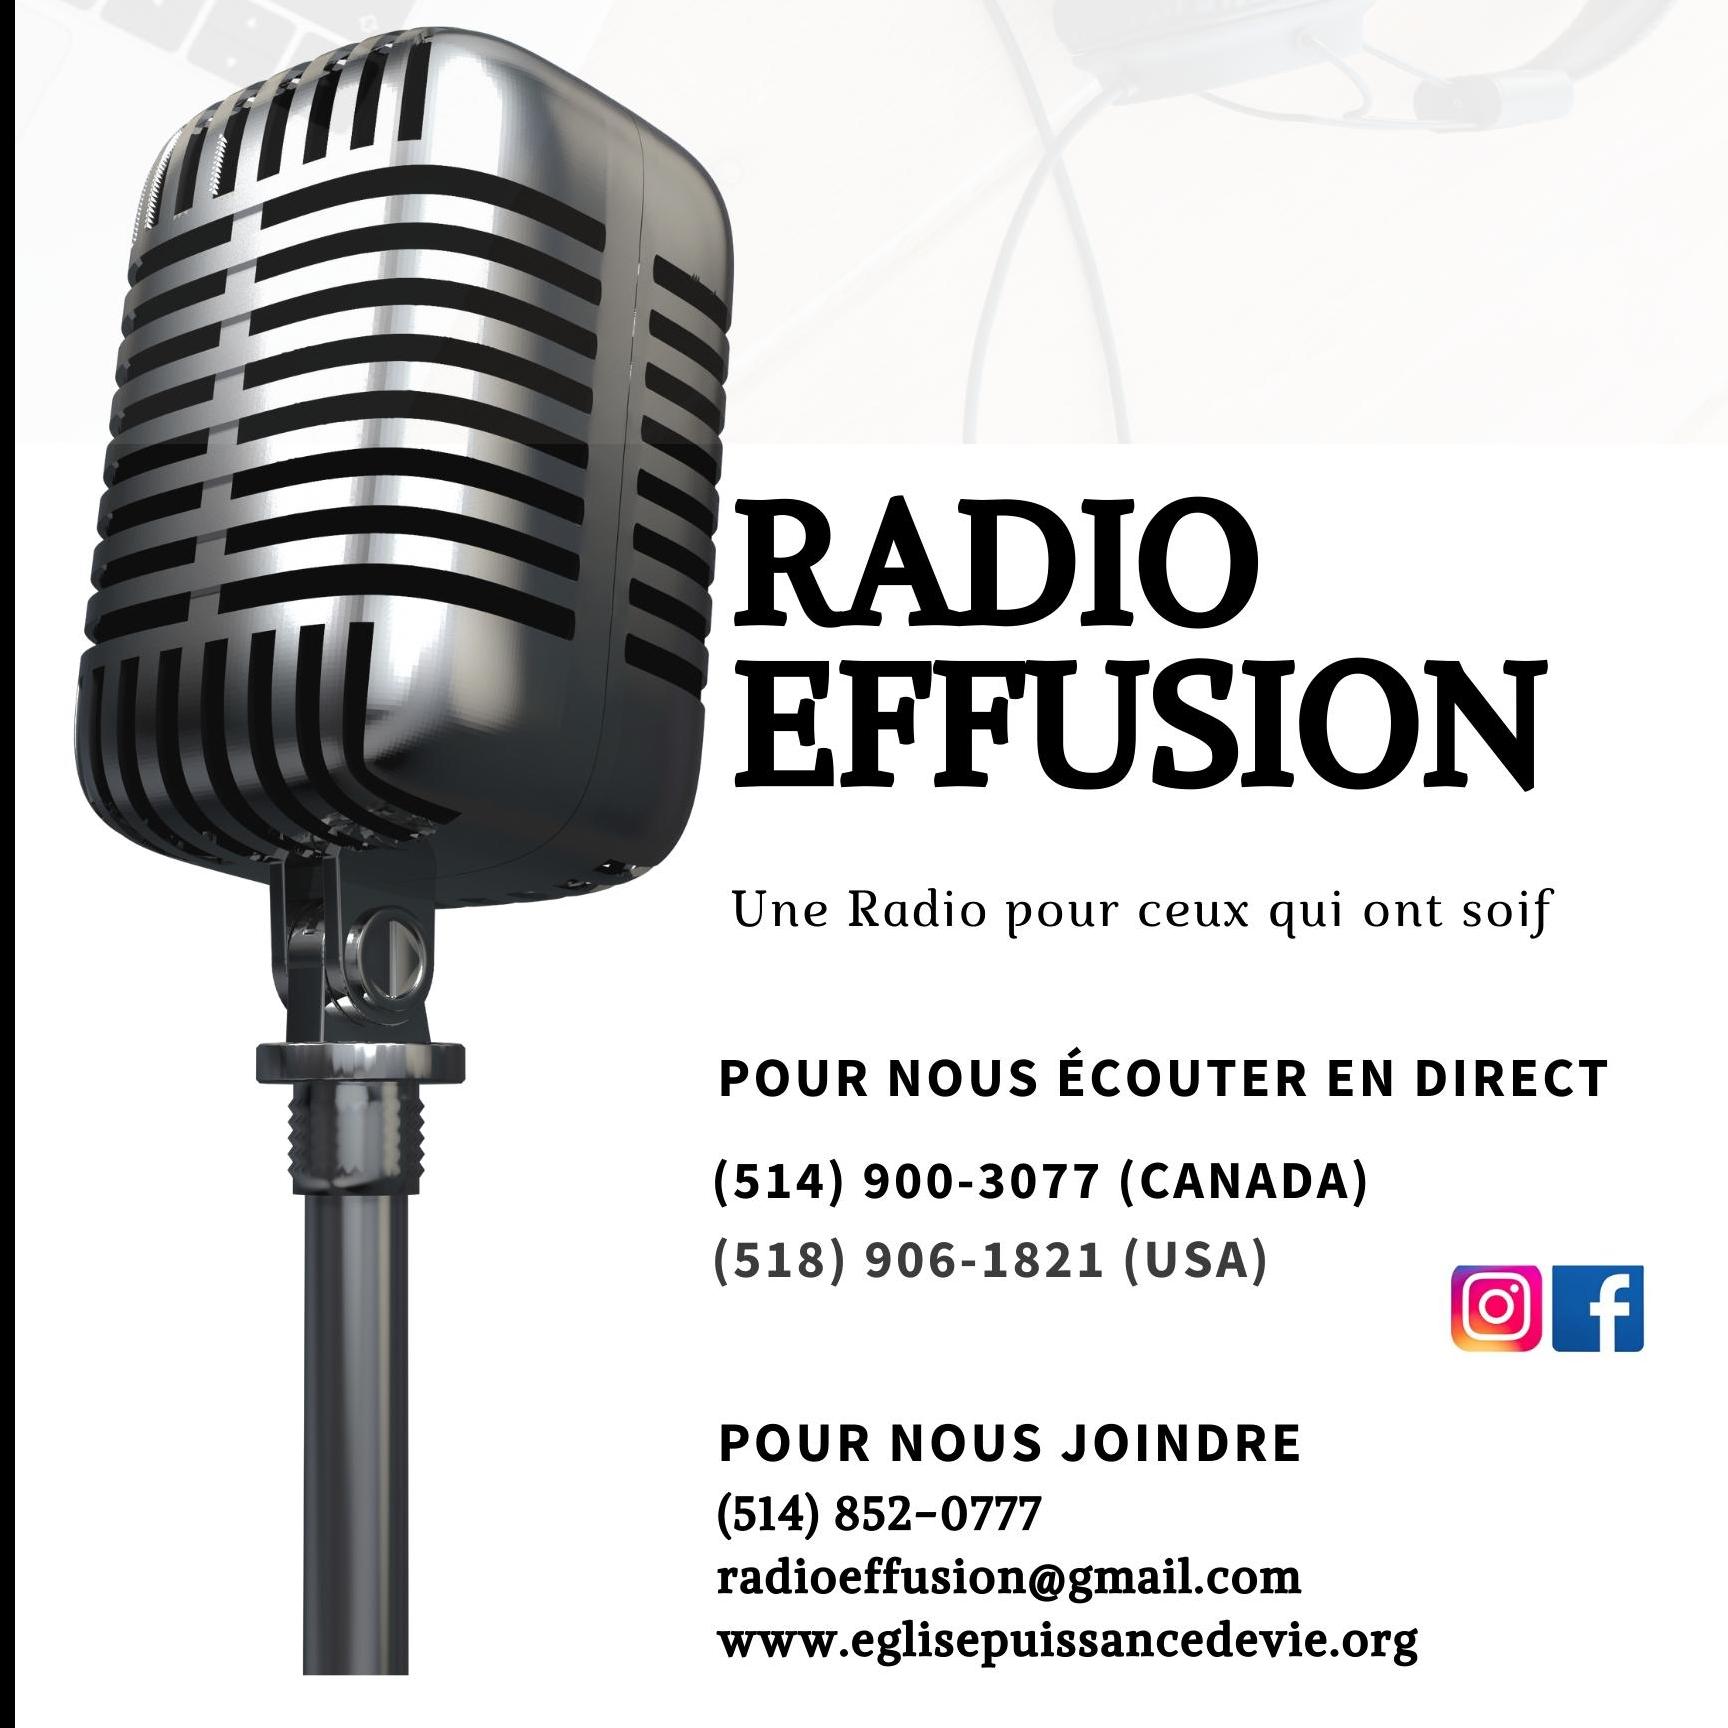 Radio Effusion